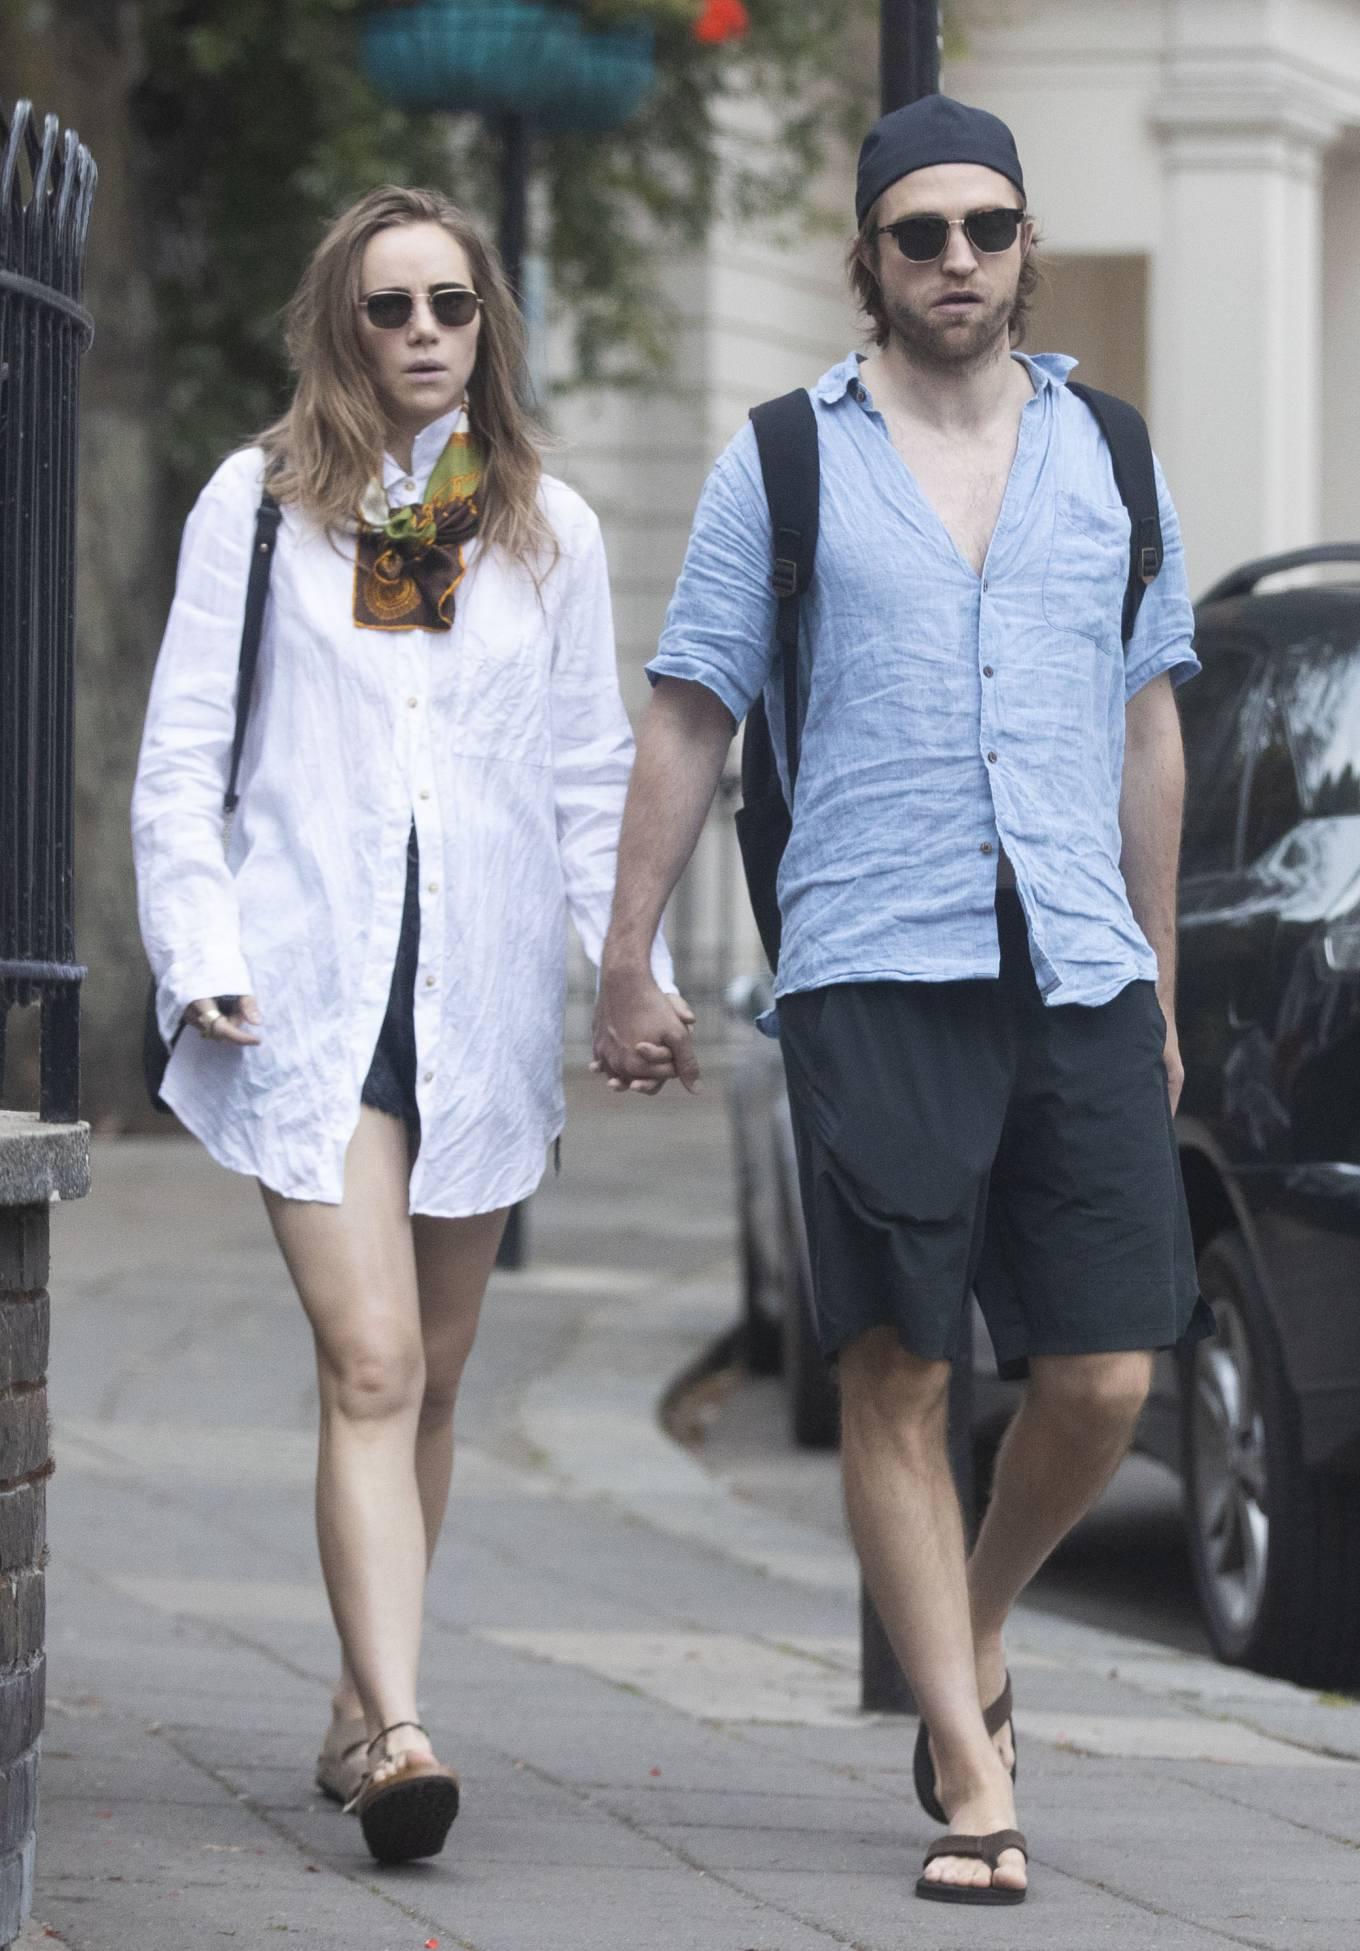 Suki Waterhouse 2020 : Suki Waterhouse and Robert Pattinson – Out in London-04